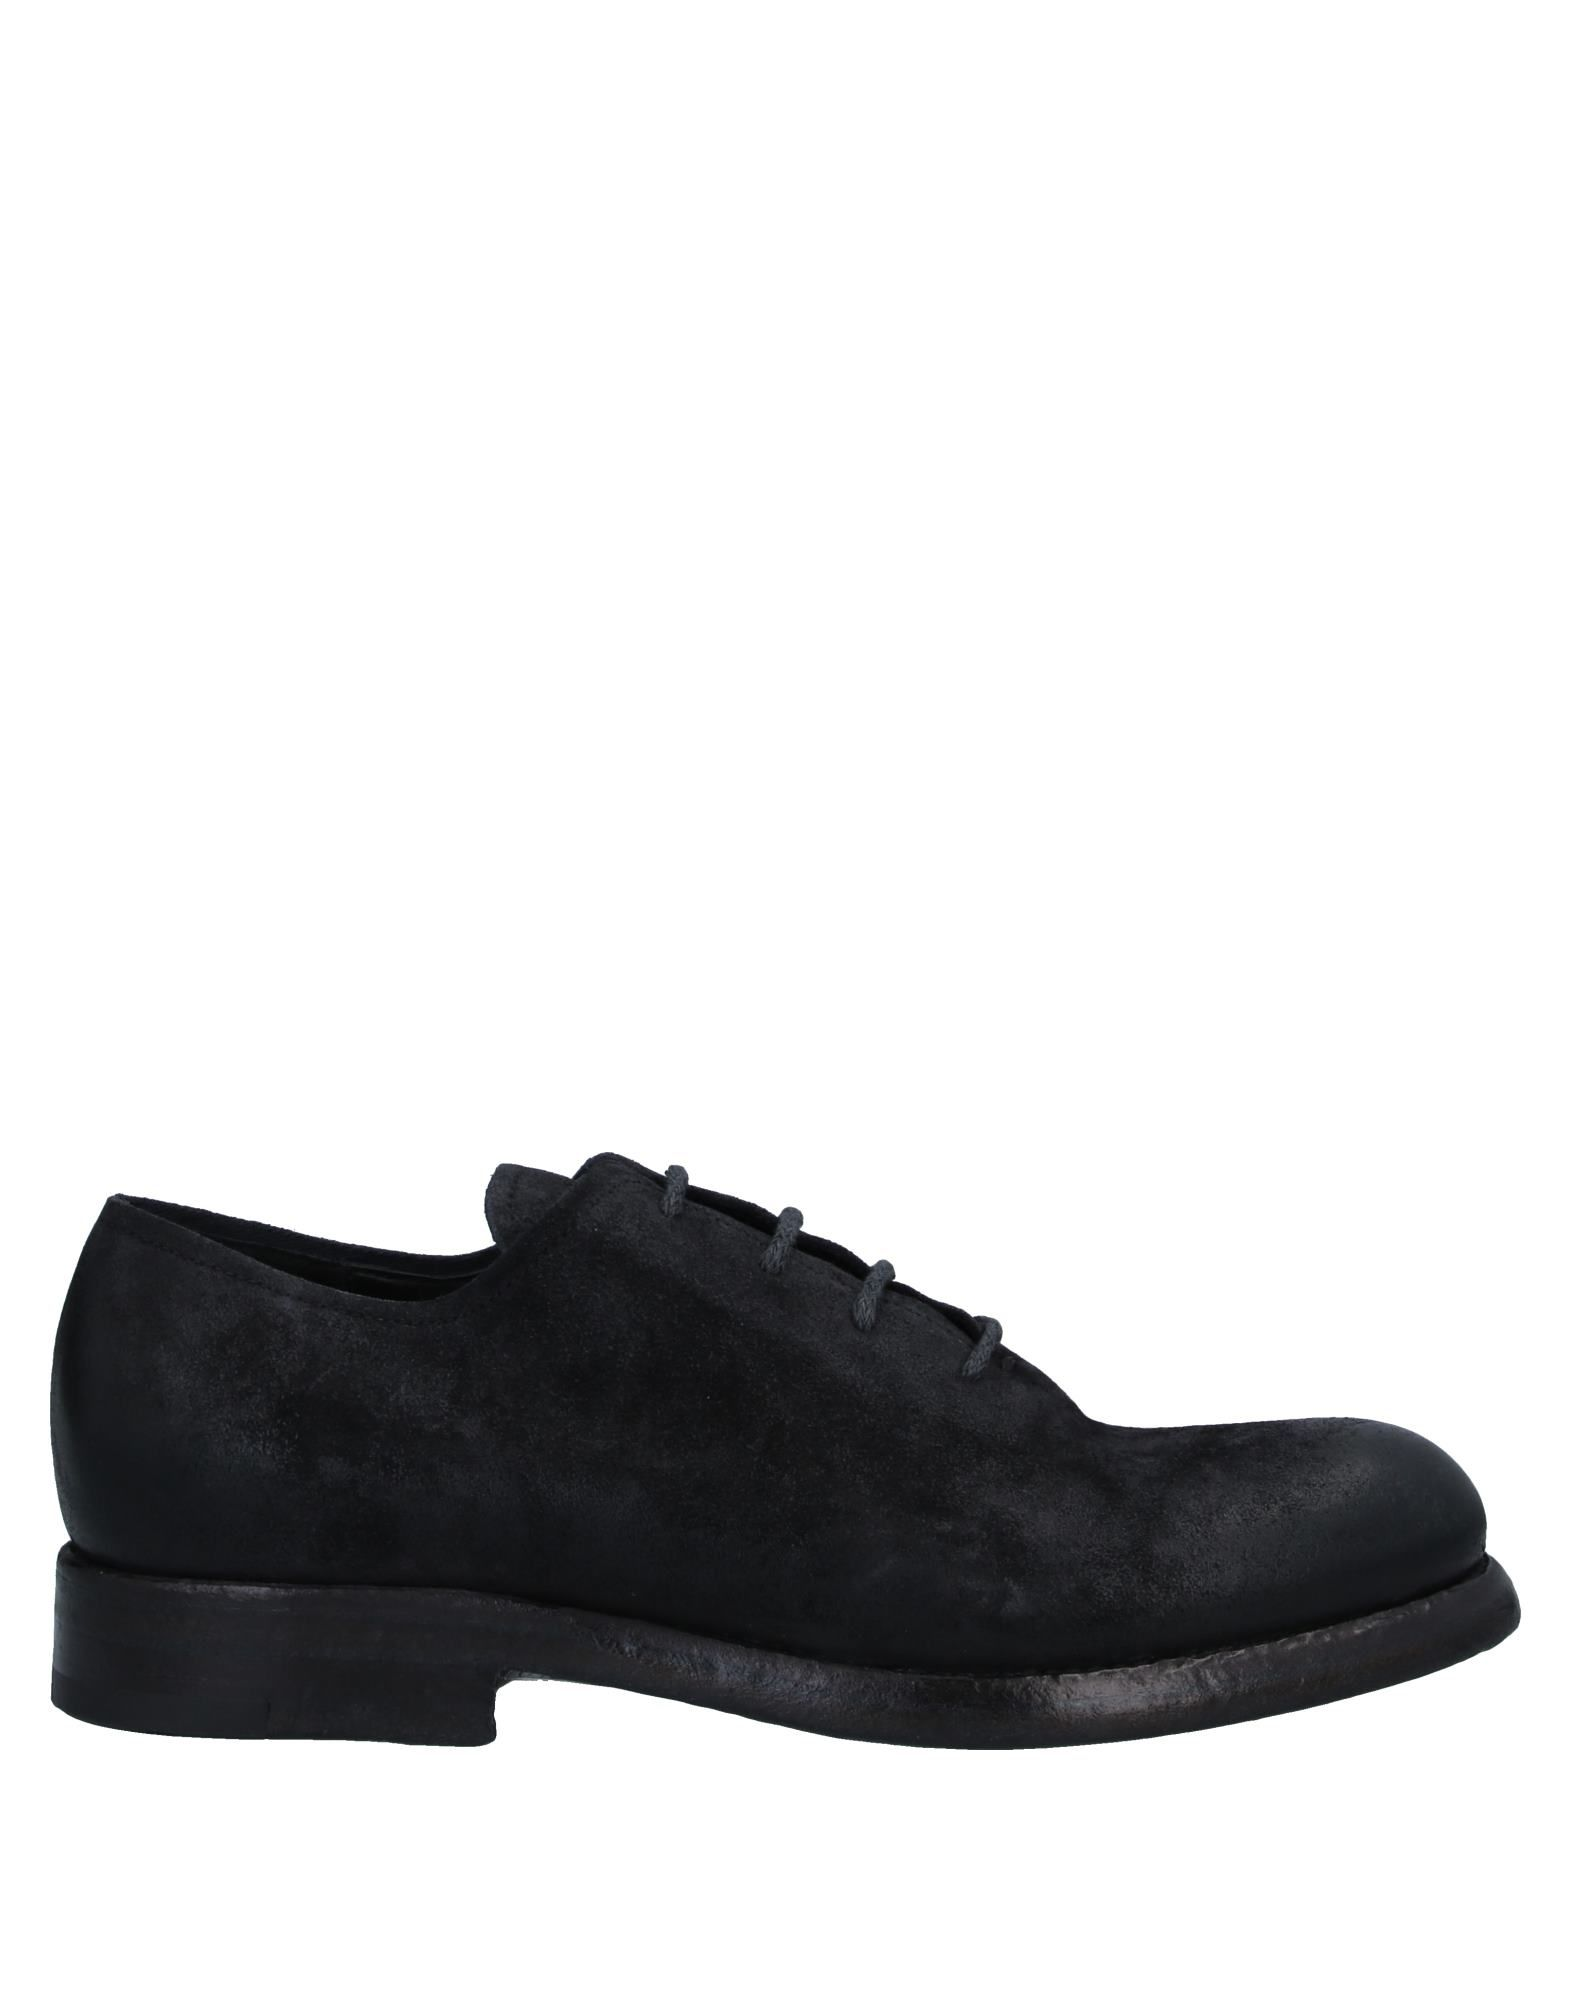 HERVE' Обувь на шнурках